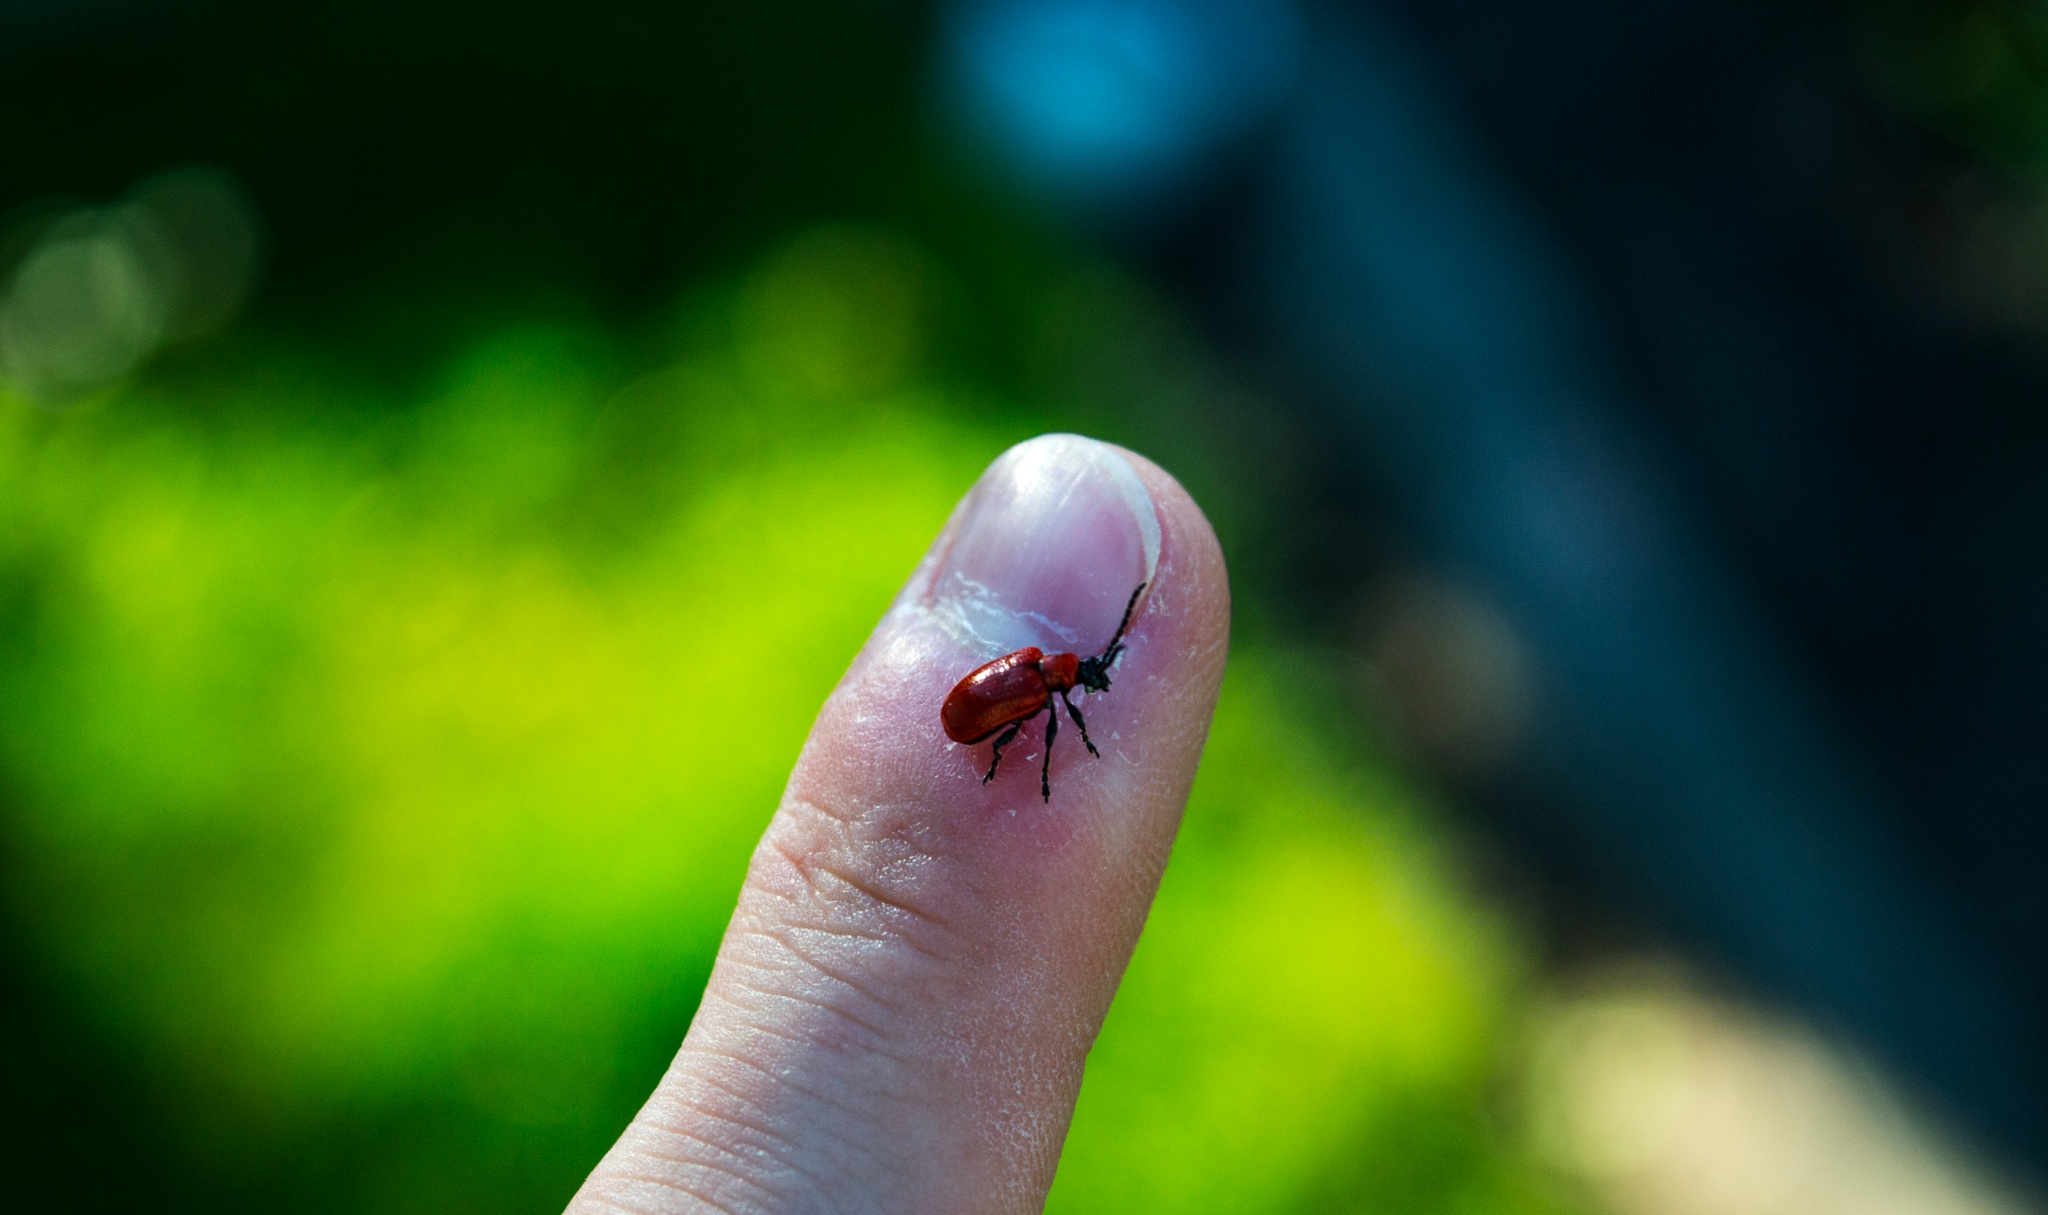 Tiny bug by Gytis